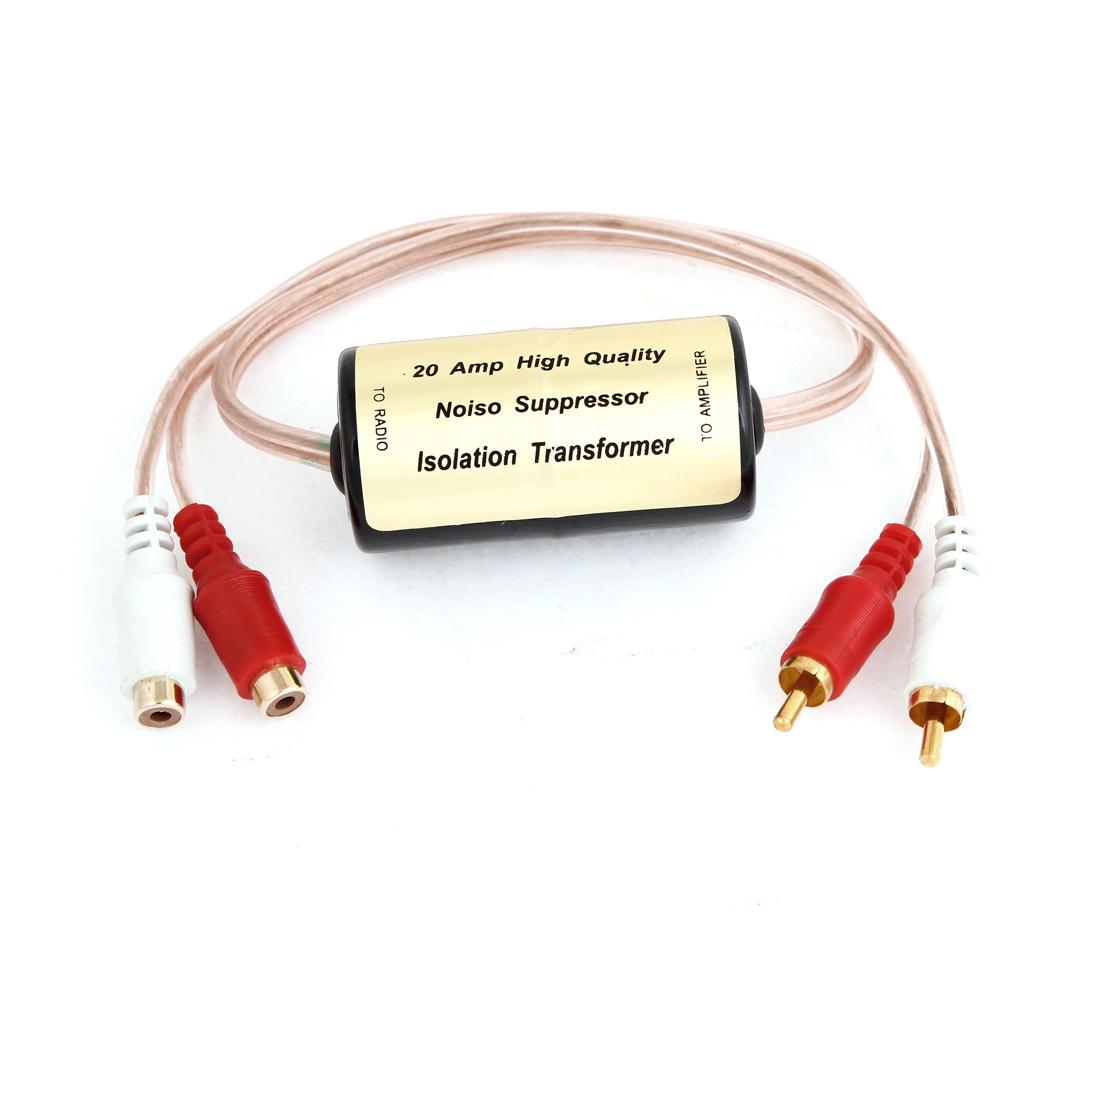 Unique Bargains Double Channel RCA Plug Audio Stereo Noise Reducer Filter 20A for Auto Car